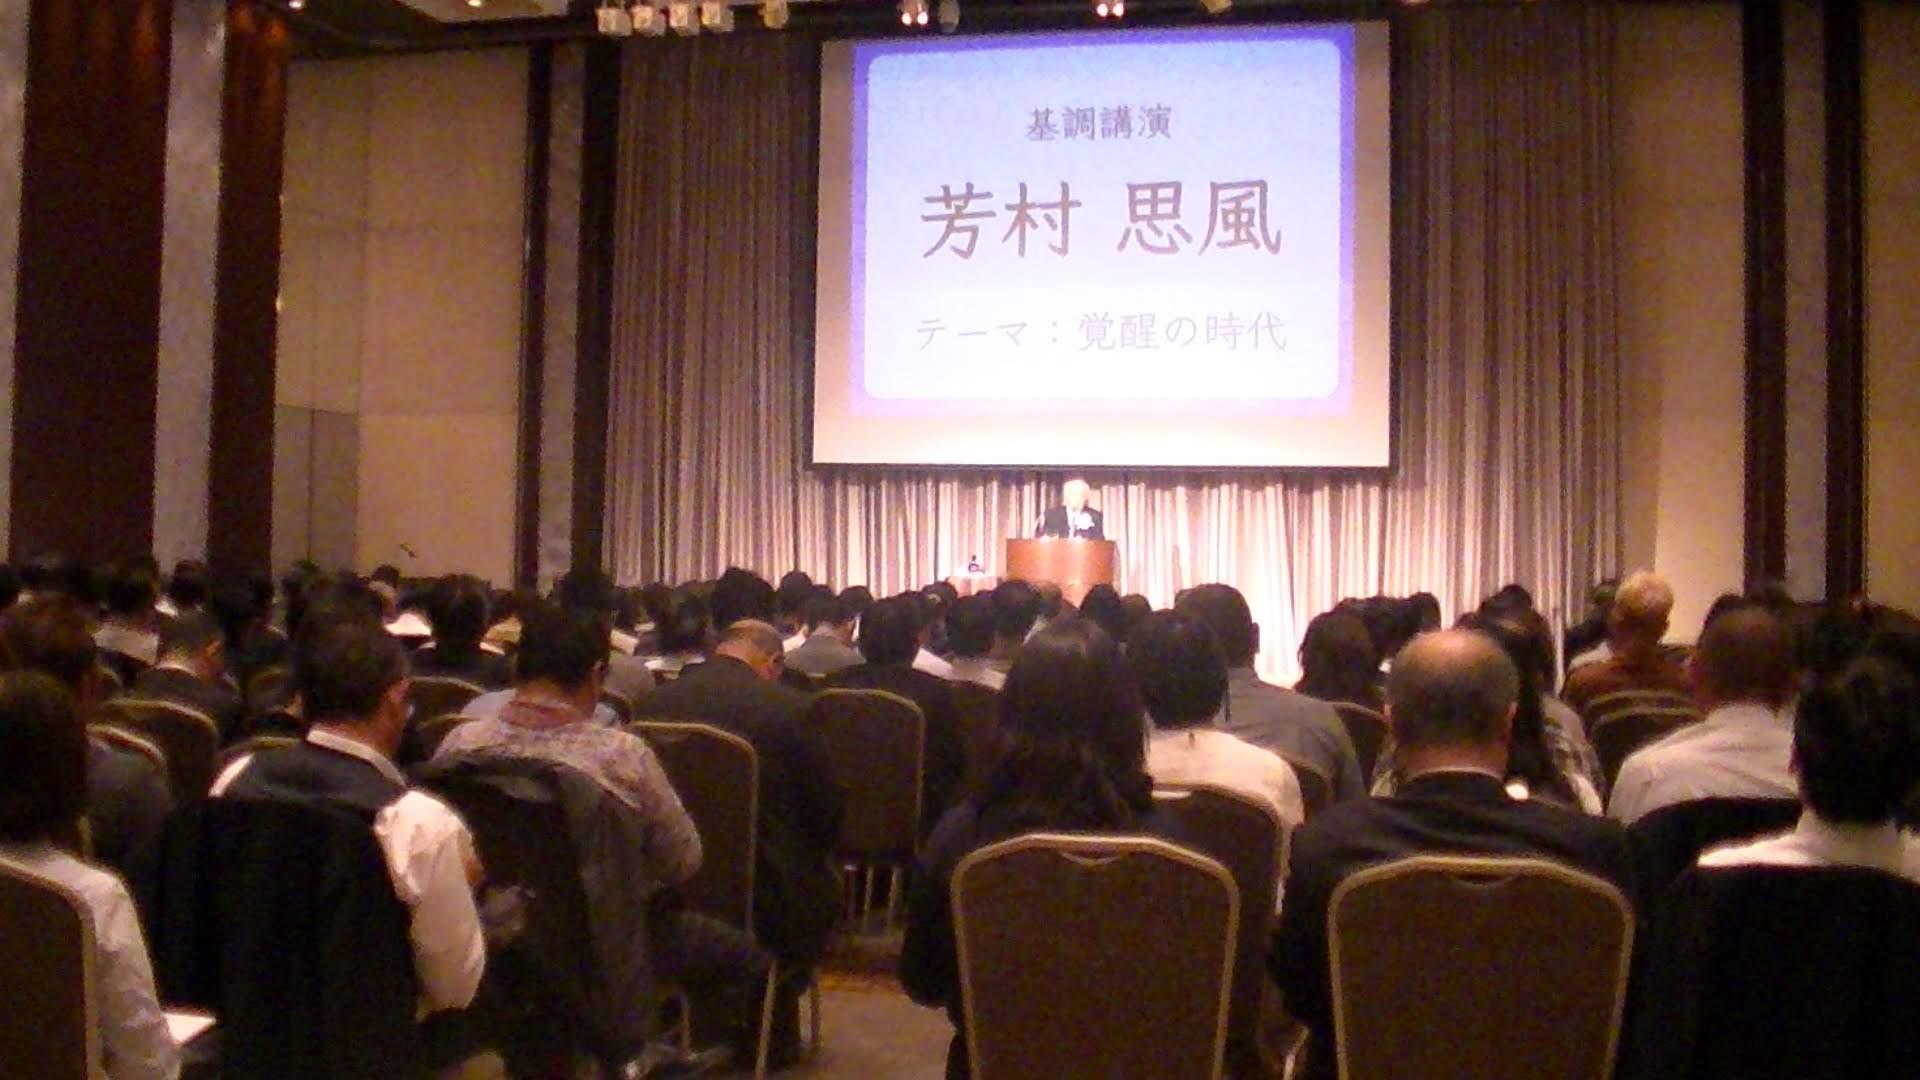 PIC 1720 1 - 思風会全国大会in広島